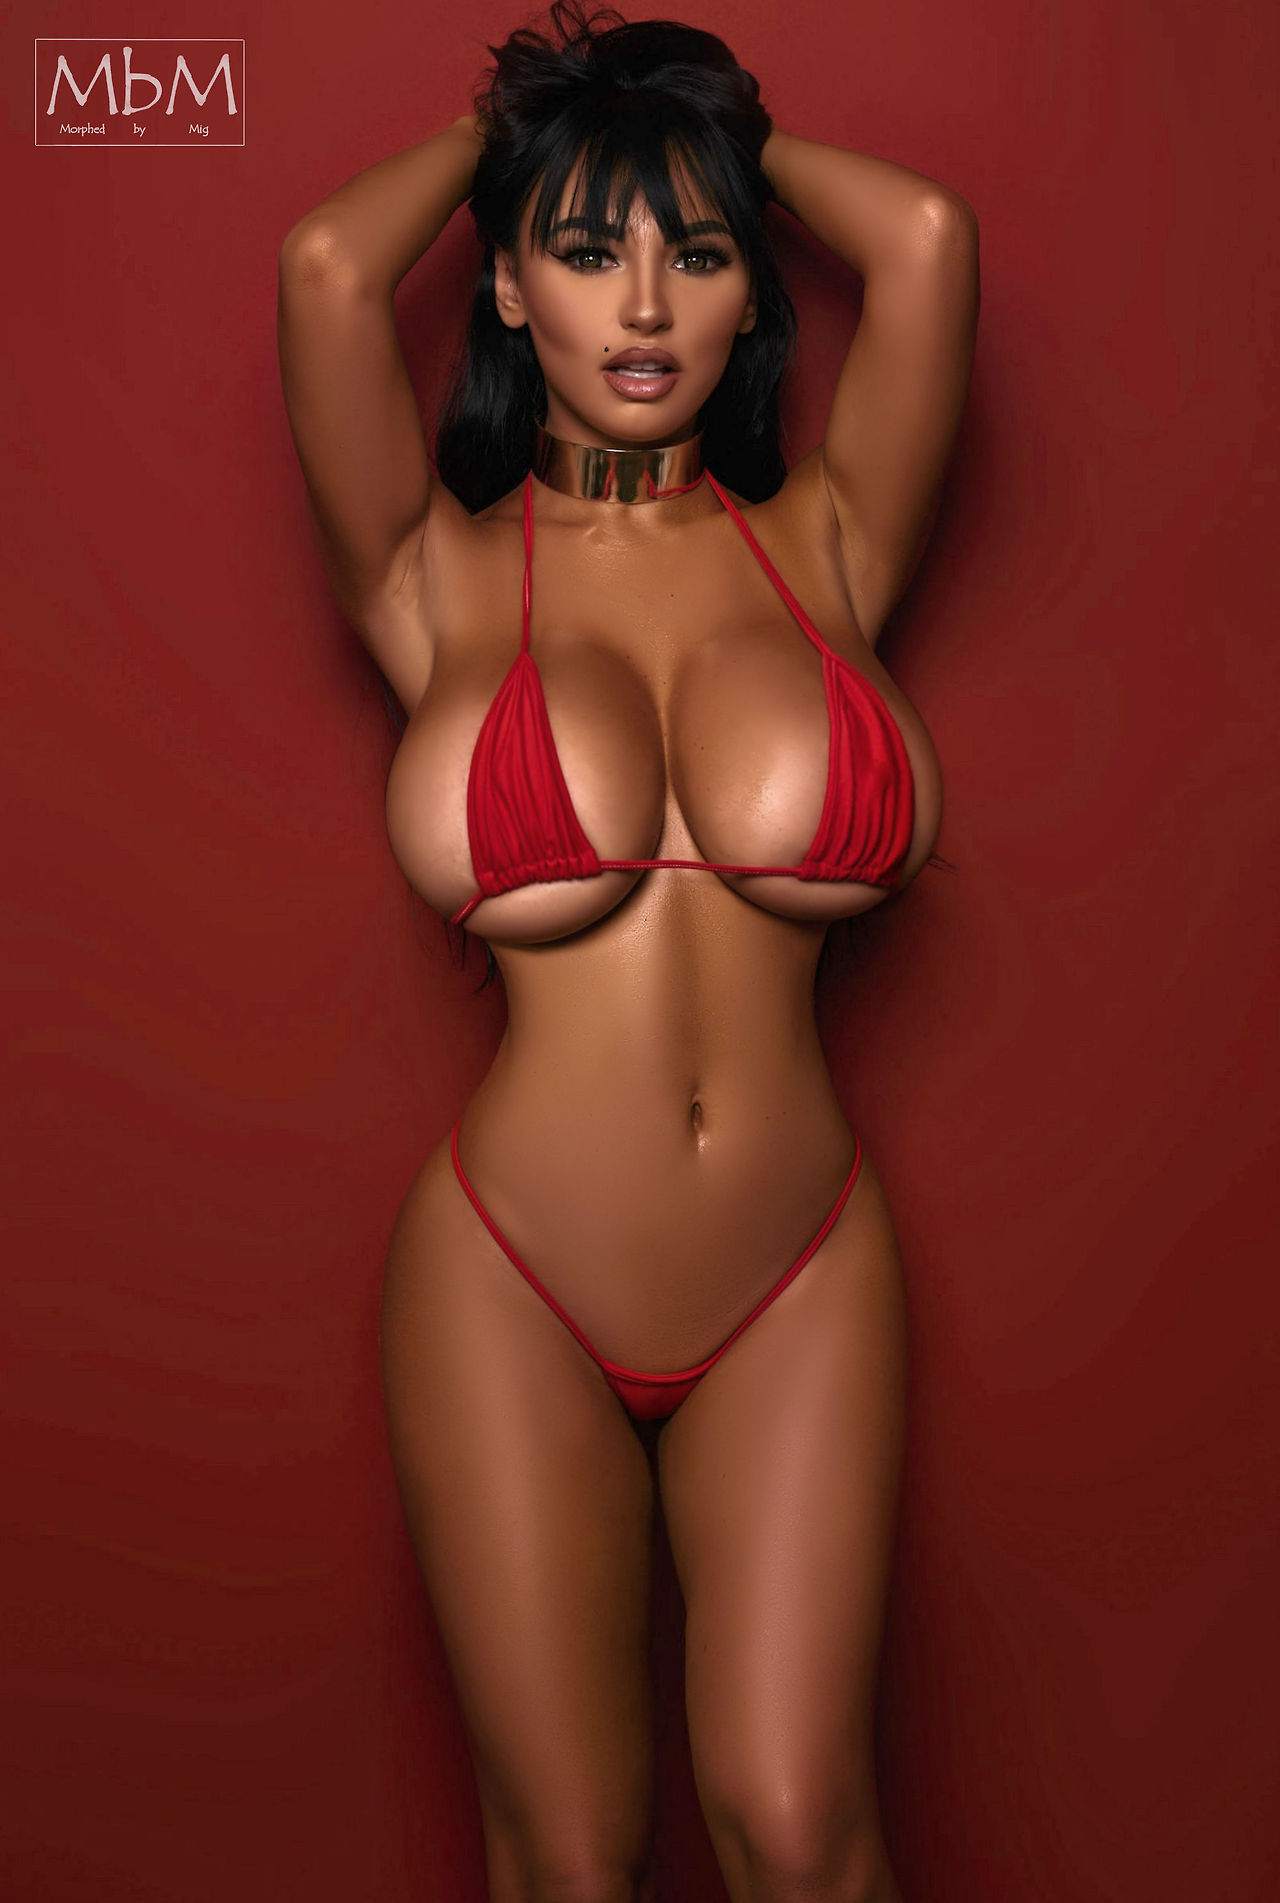 Chubby massive tits